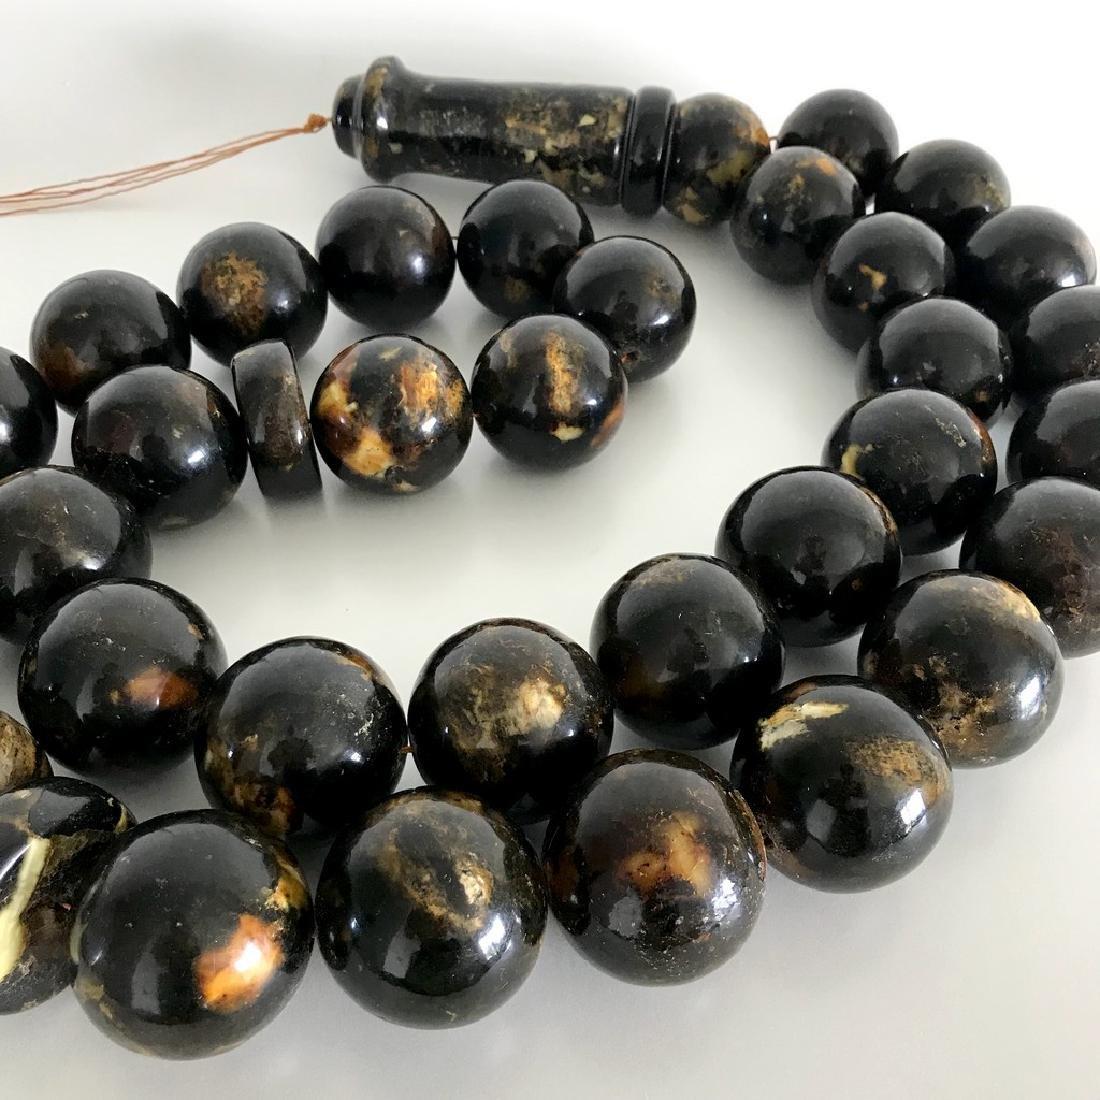 Rare exclusive size 2kg Baltic amber tesbih beads ø45 - 4